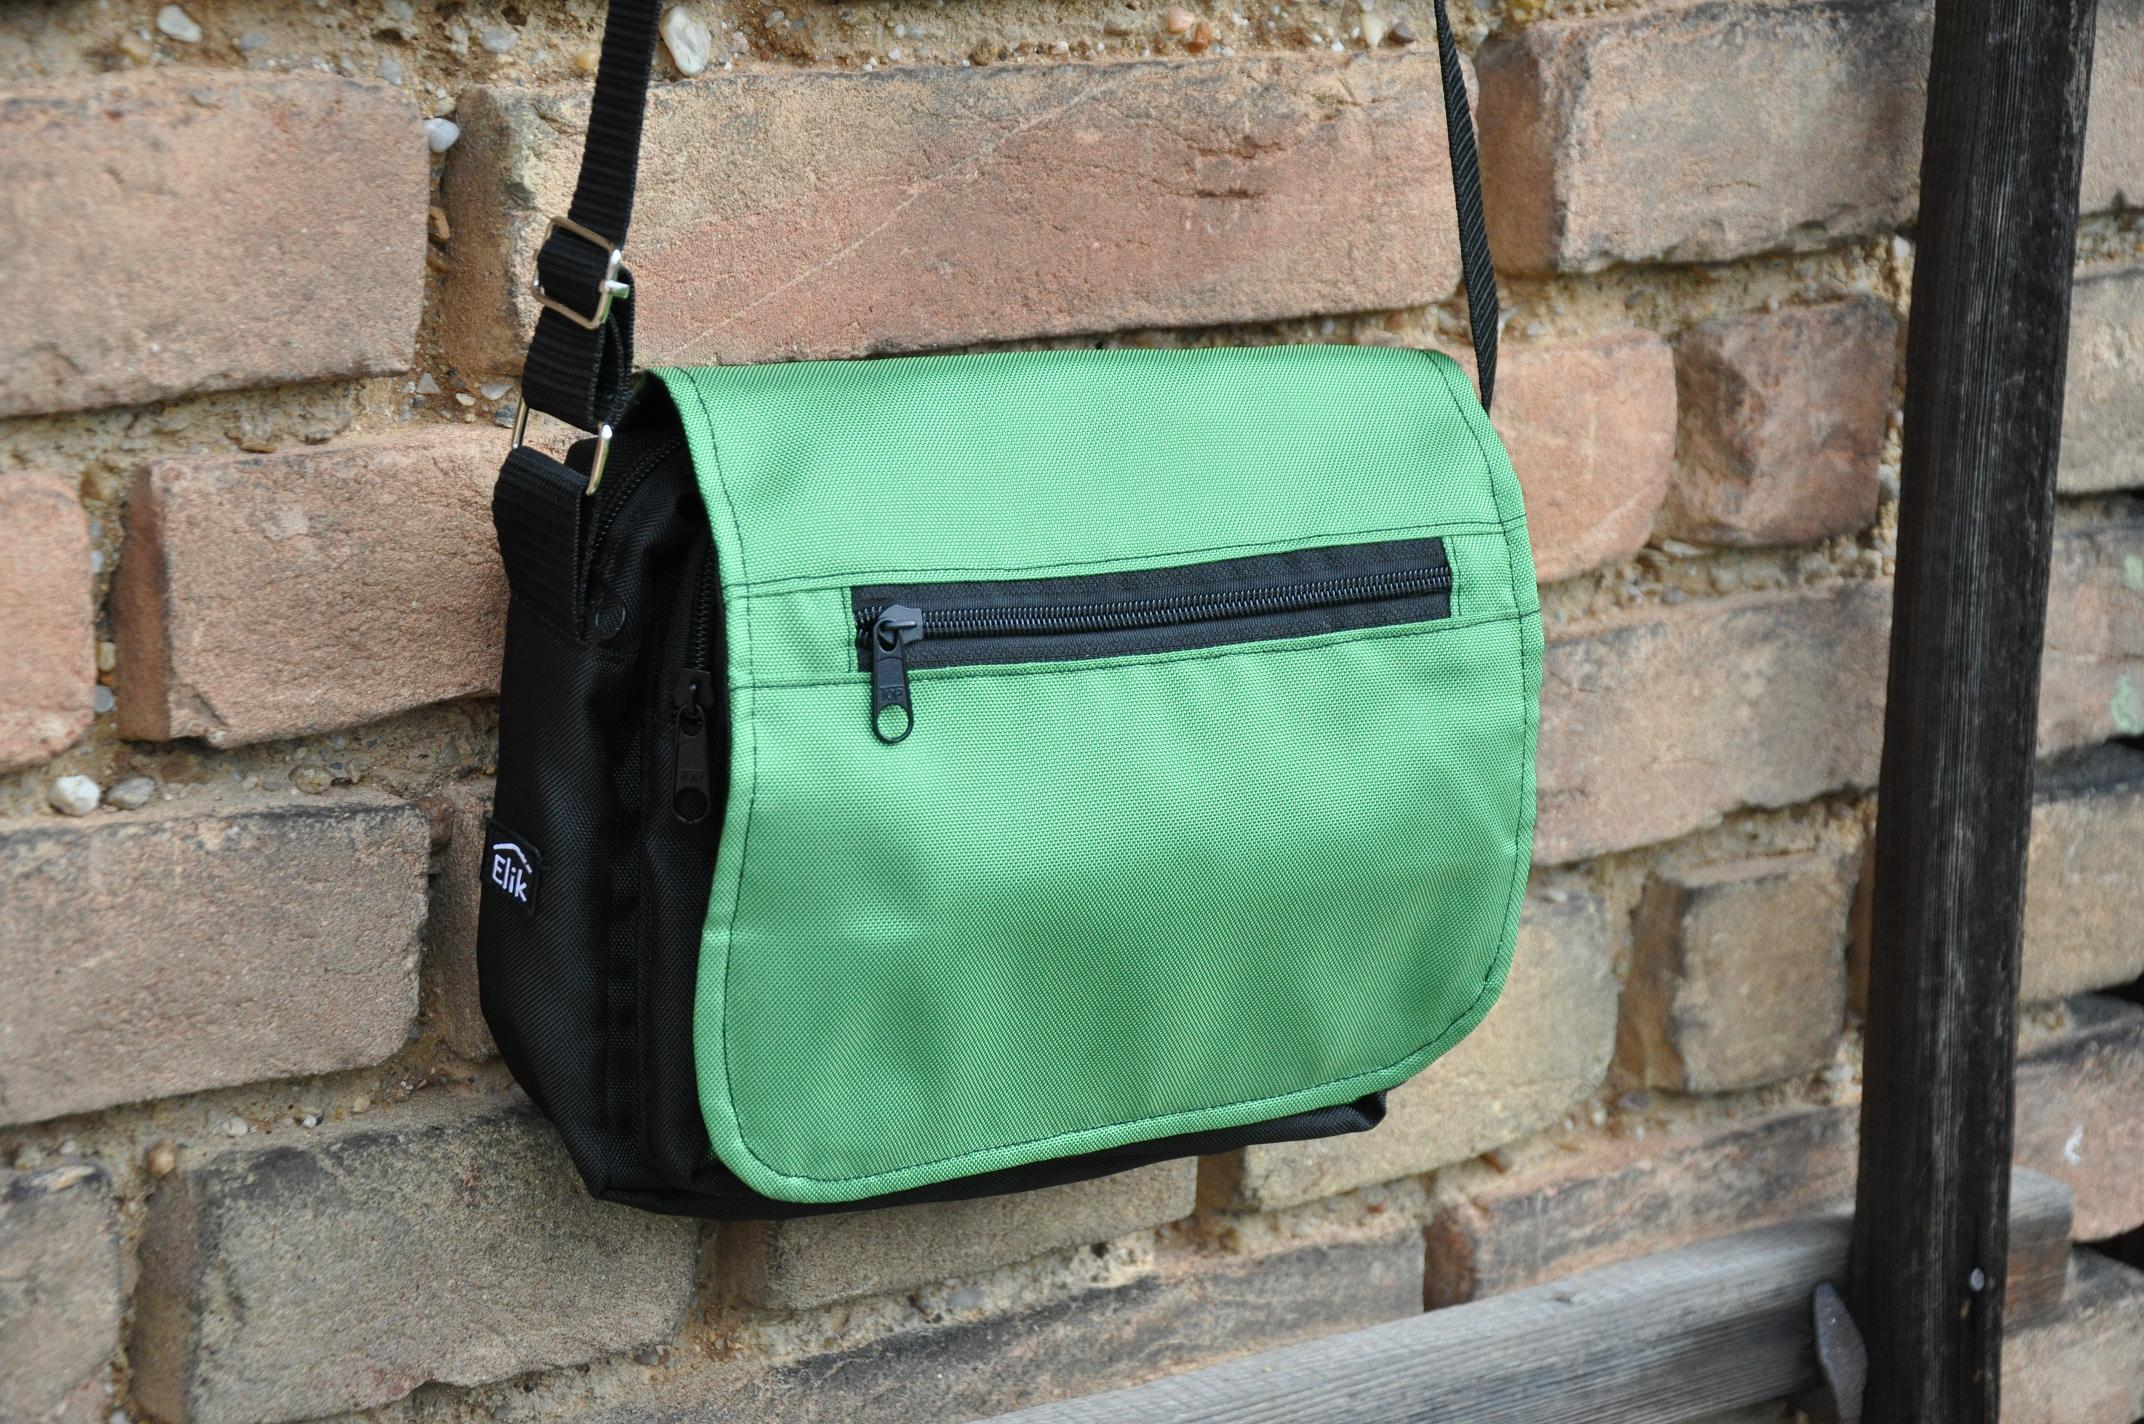 Taška na doklady jednobarevná Barva: Zelená